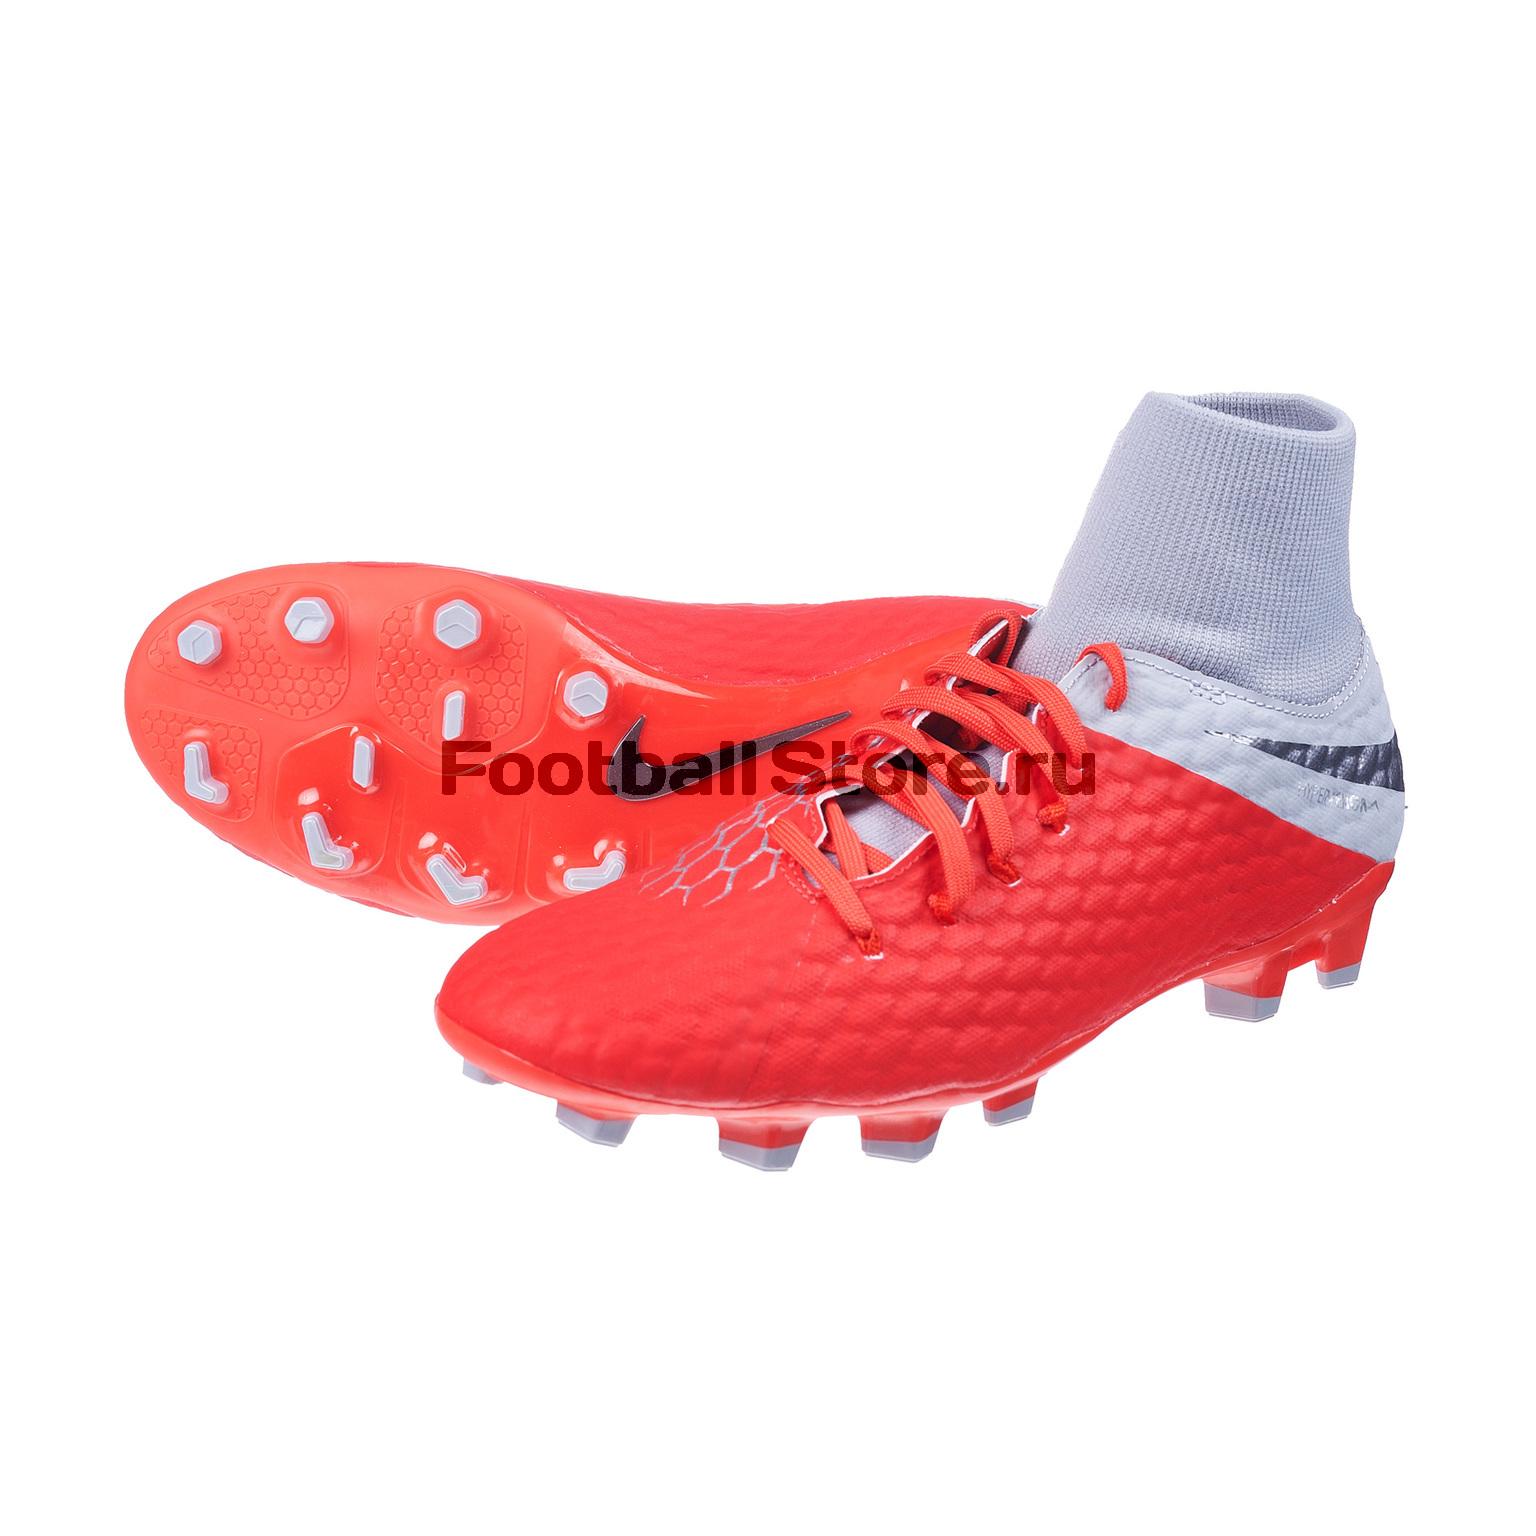 Бутсы Nike Hypervenom 3 Academy DF FG AQ9217-600 бутсы nike phantom 3 academy df fg ah7268 081